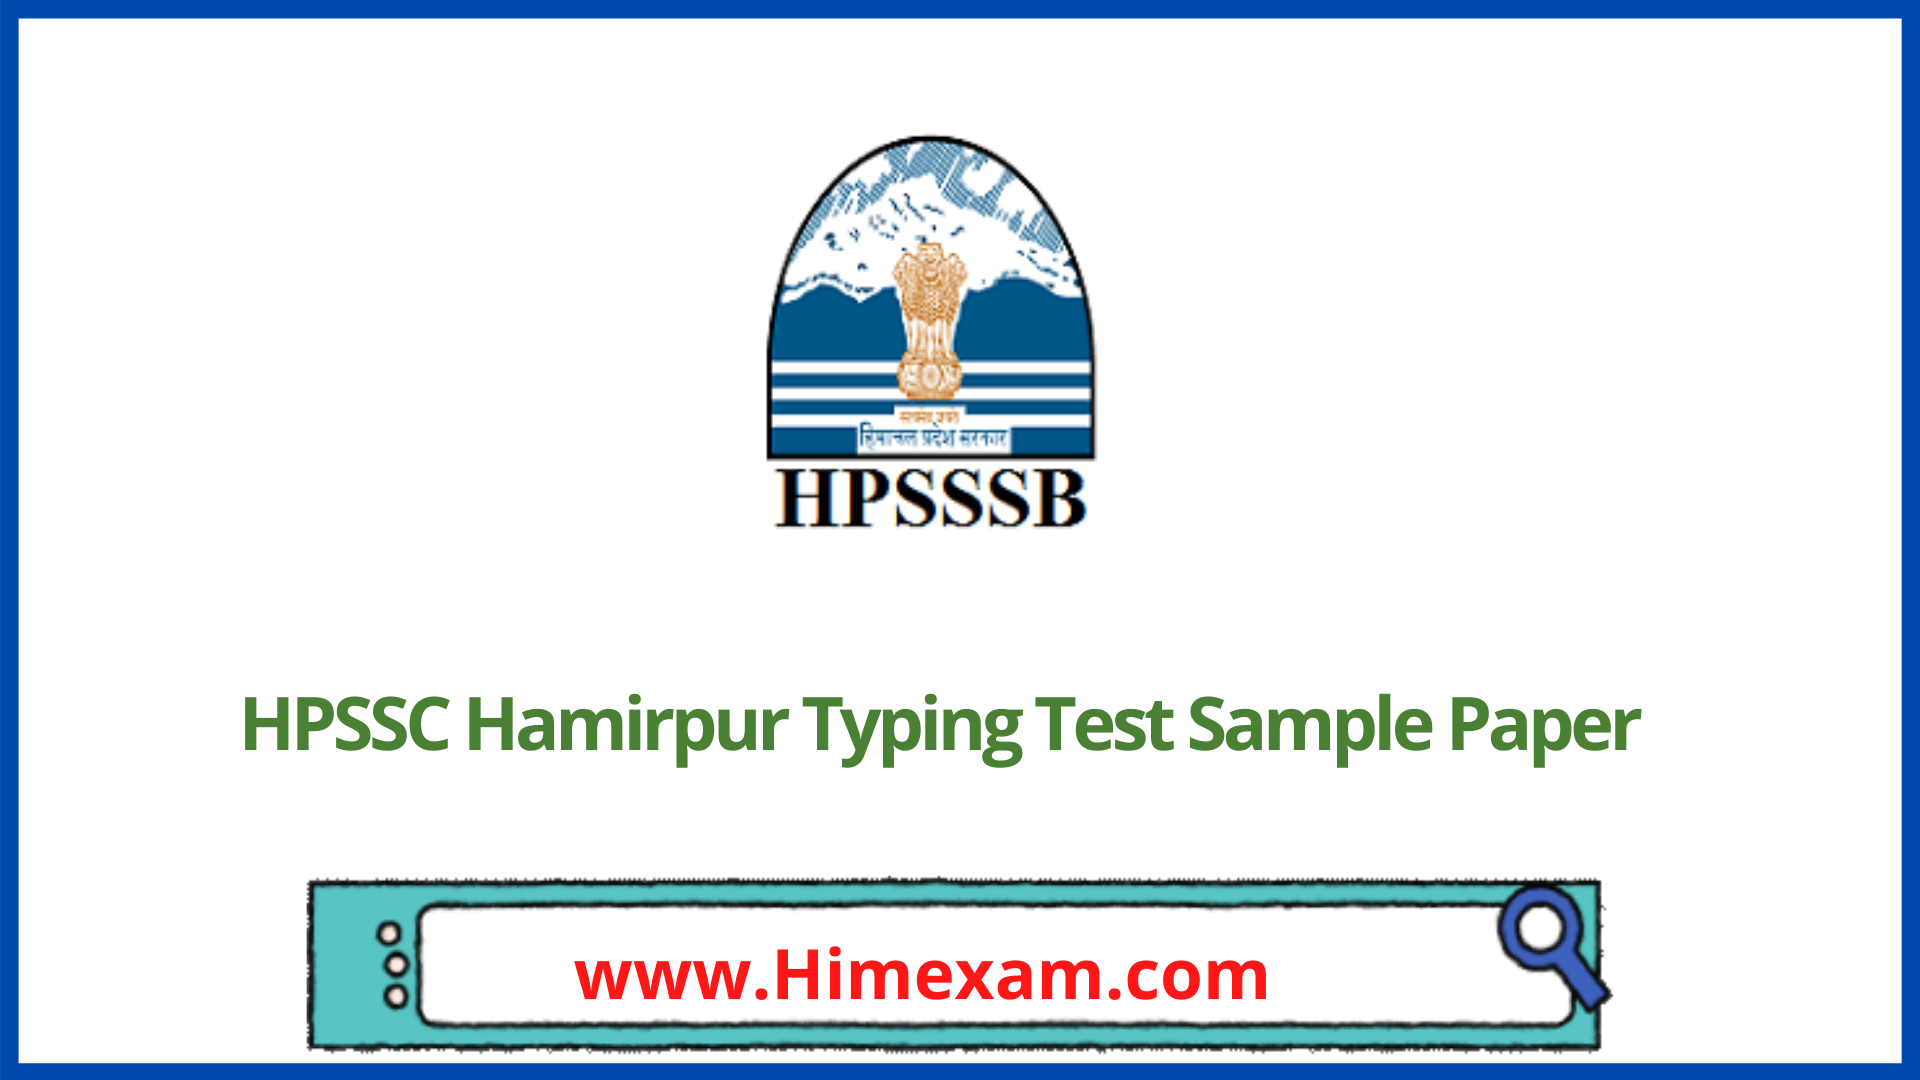 HPSSC Hamirpur Typing Test Sample Paper